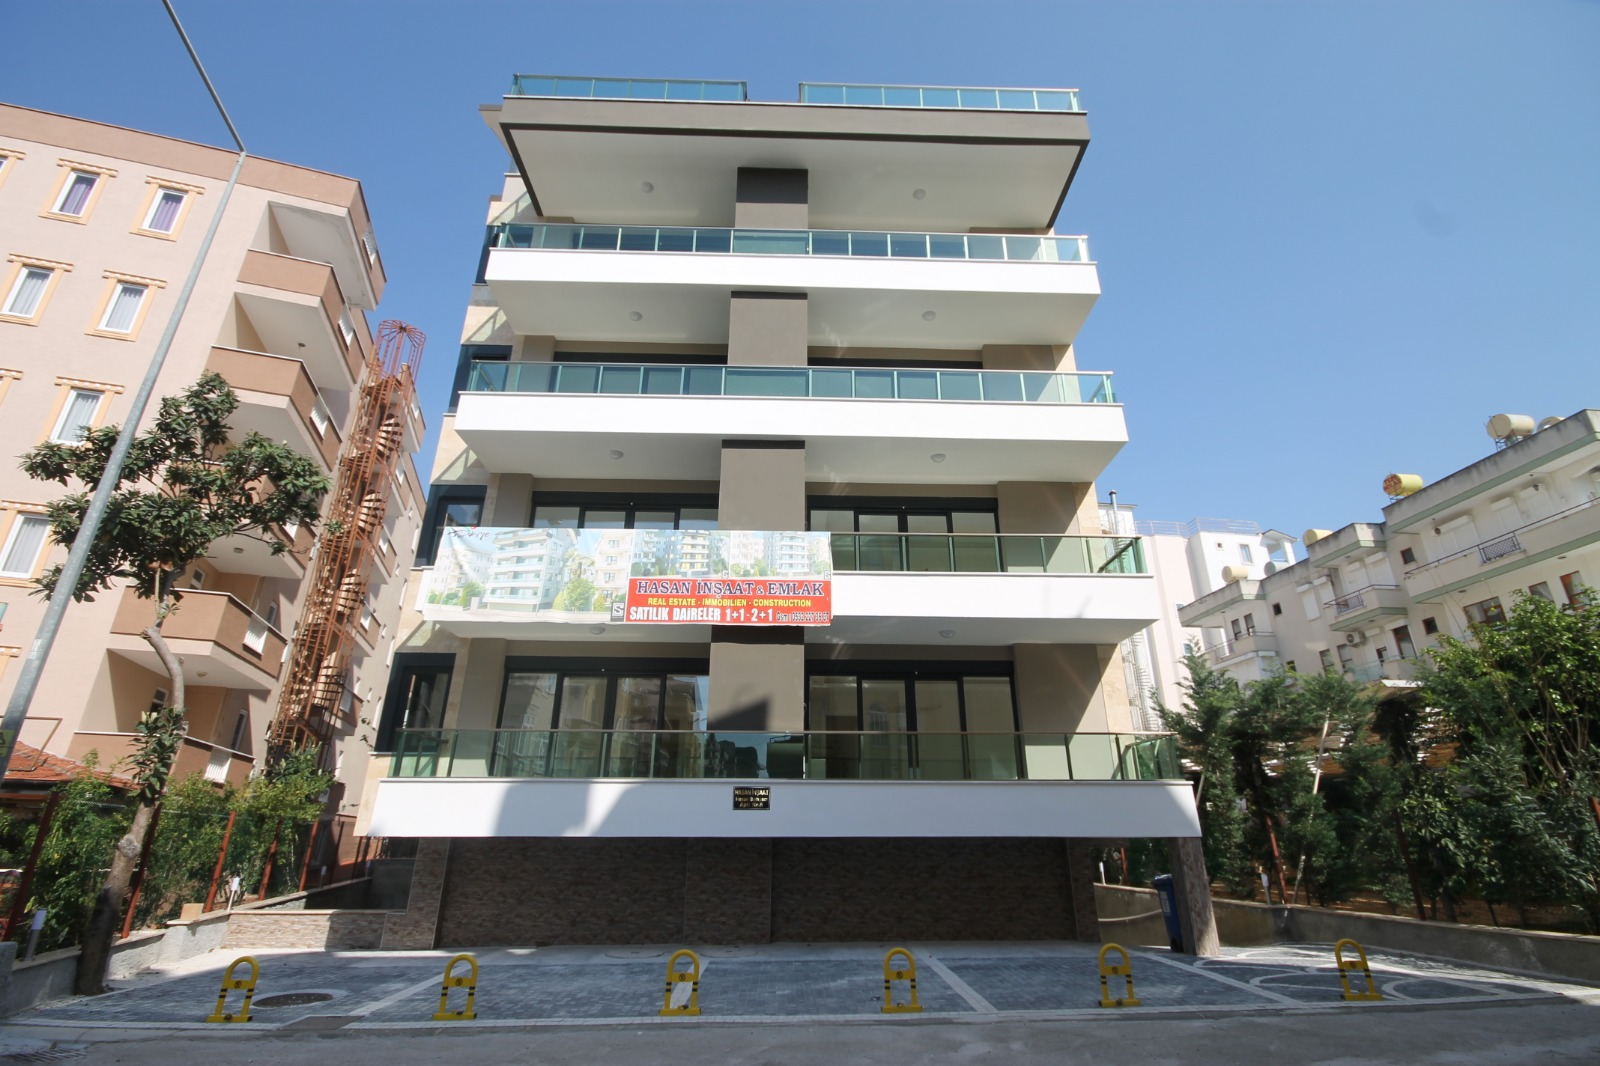 Квартира 1+1 в центре Аланьи